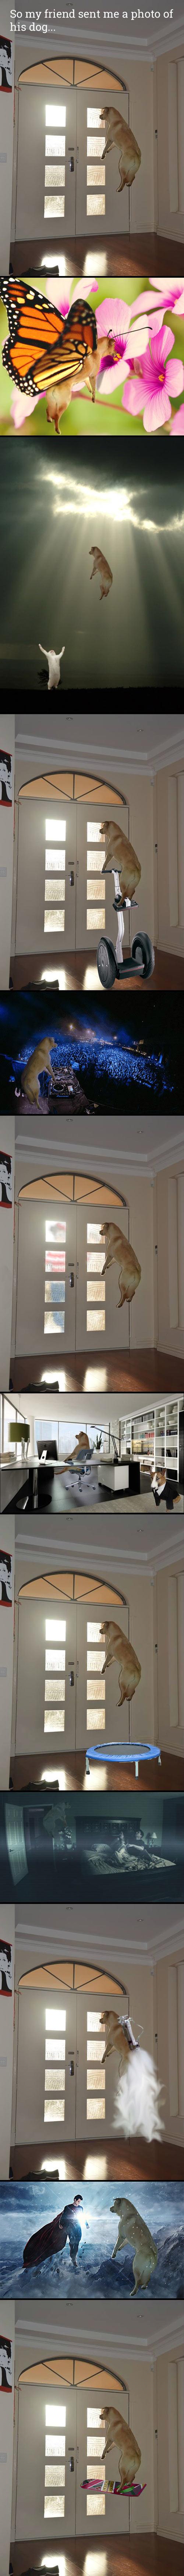 funny-dog-jump-Photoshop